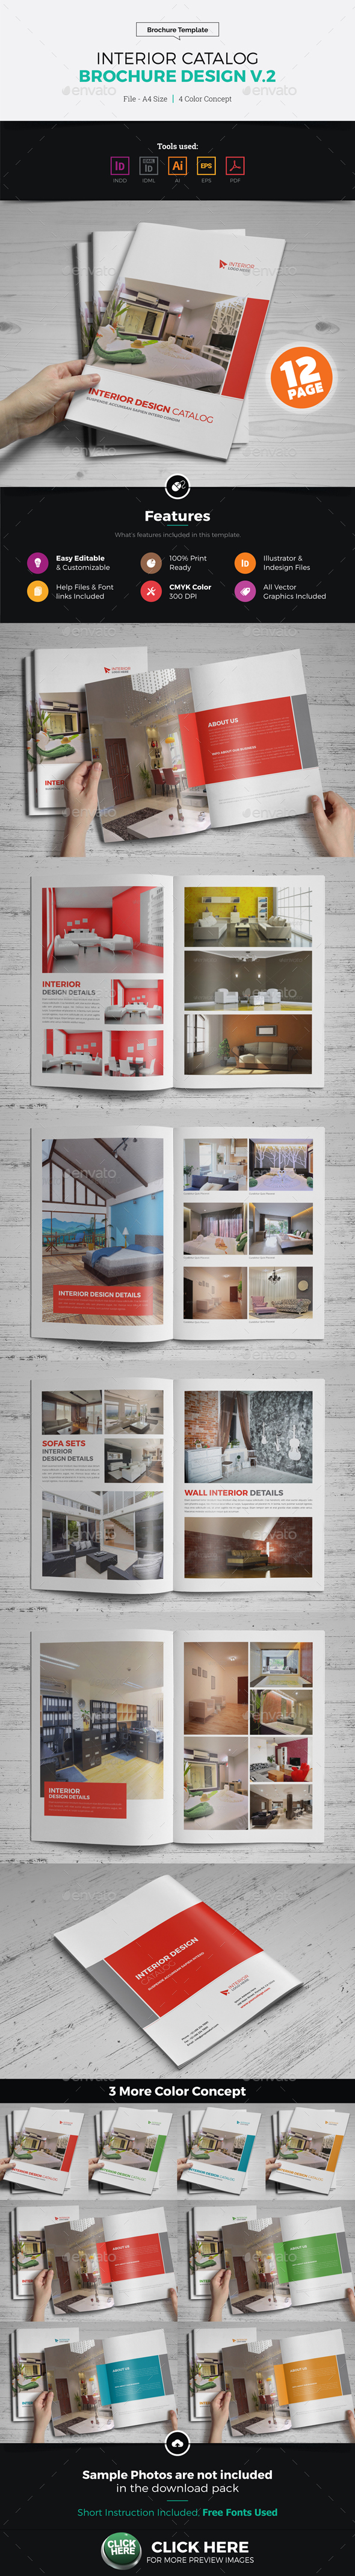 Interior Brochure Catalog Design v2 - Corporate Brochures